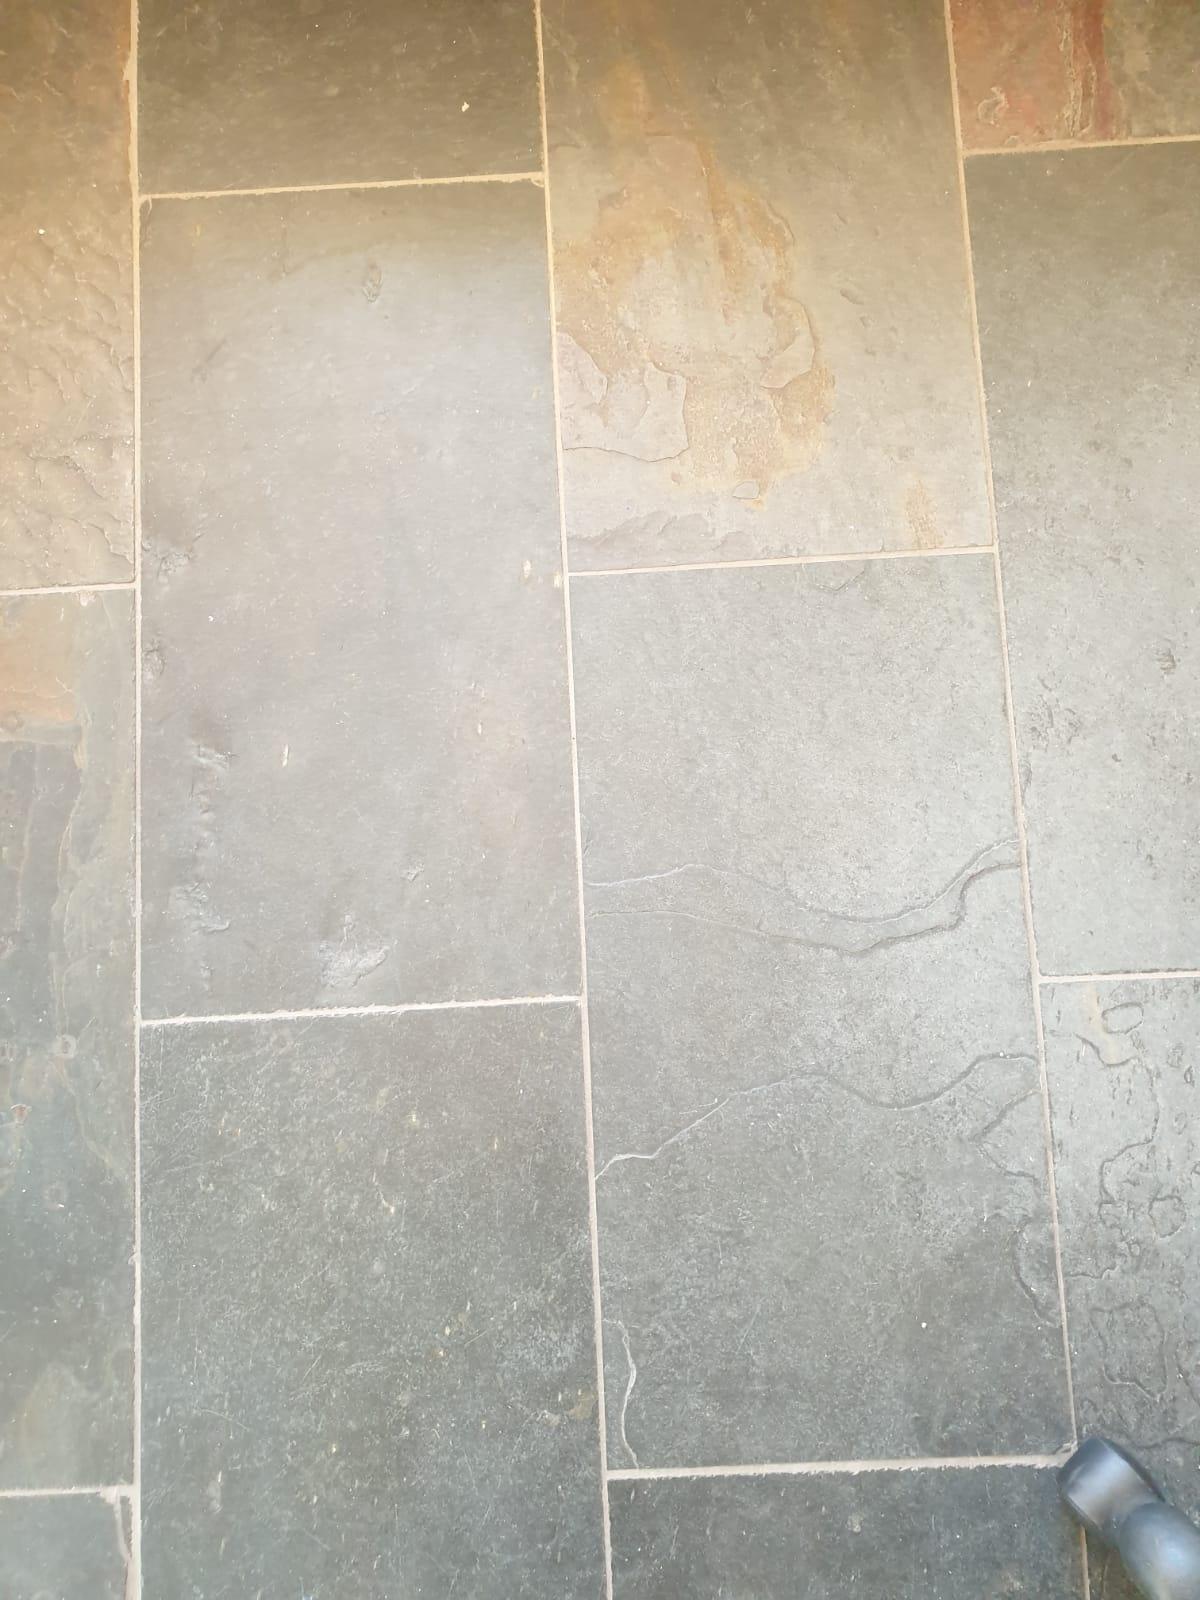 Slate deep cleaned finished with a matt sealer